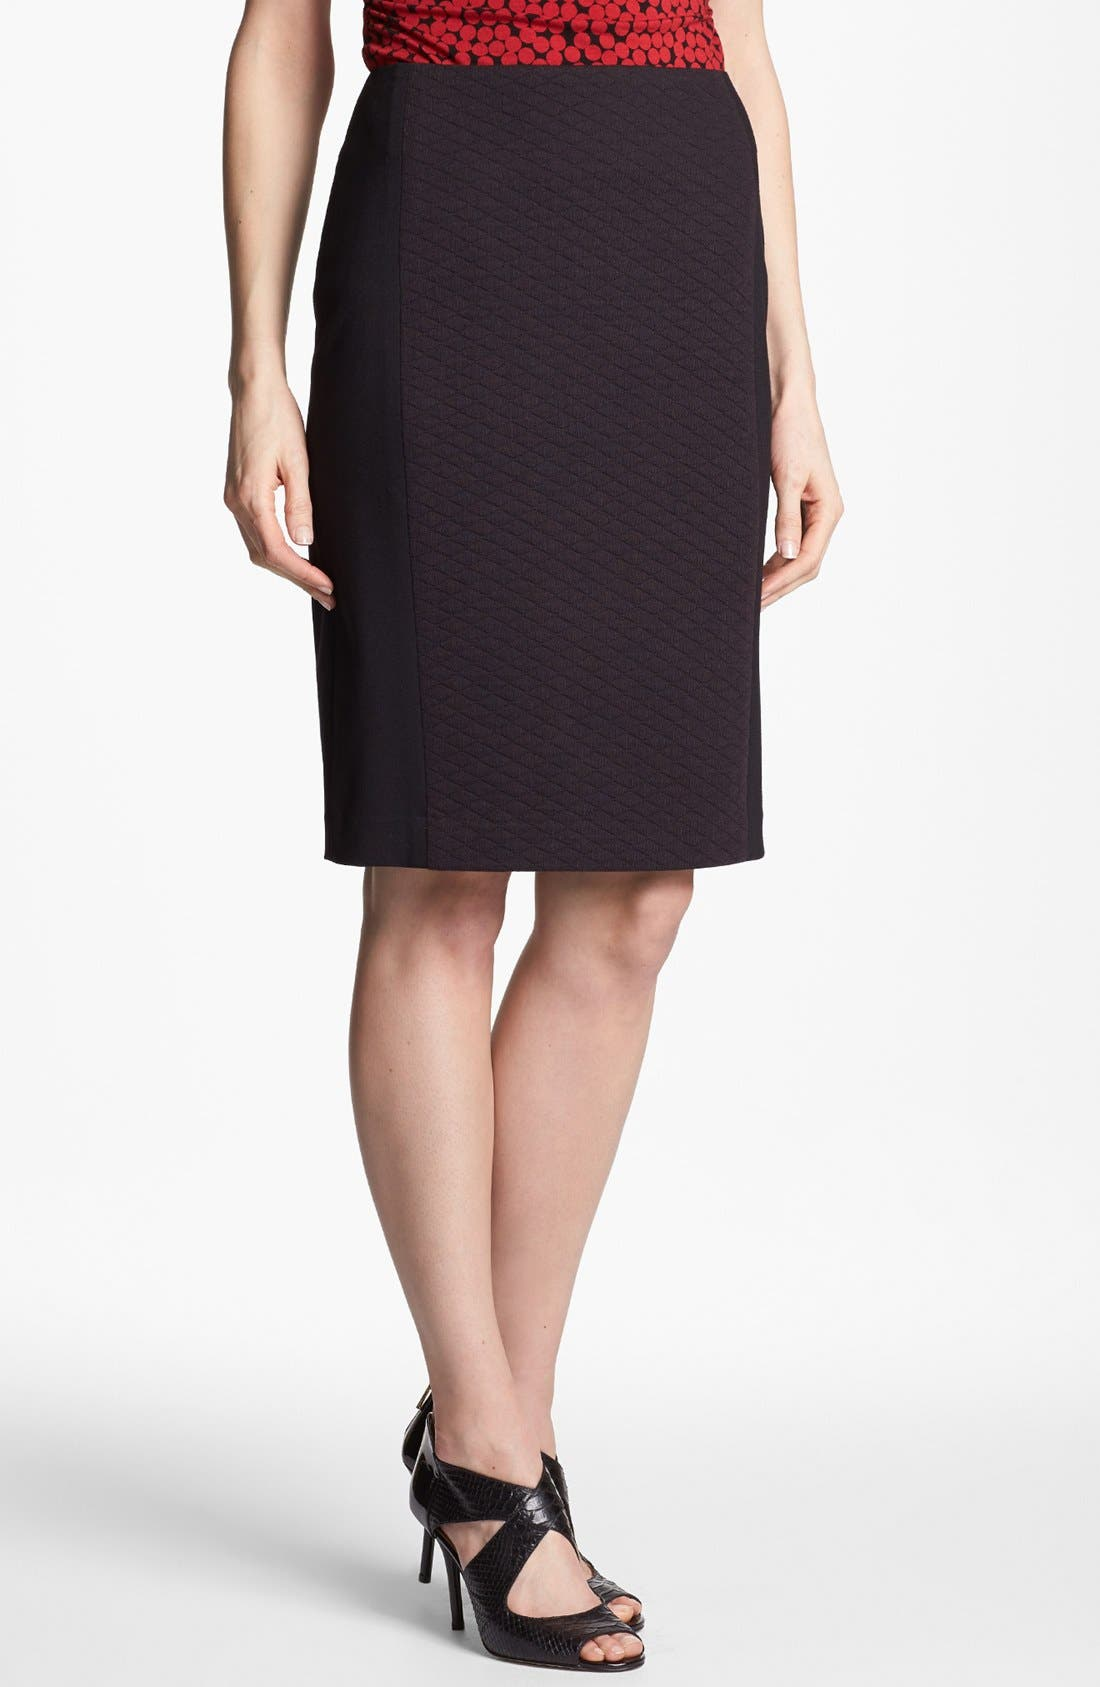 Alternate Image 1 Selected - Halogen® Quilted Front Ponte Knit Pencil Skirt